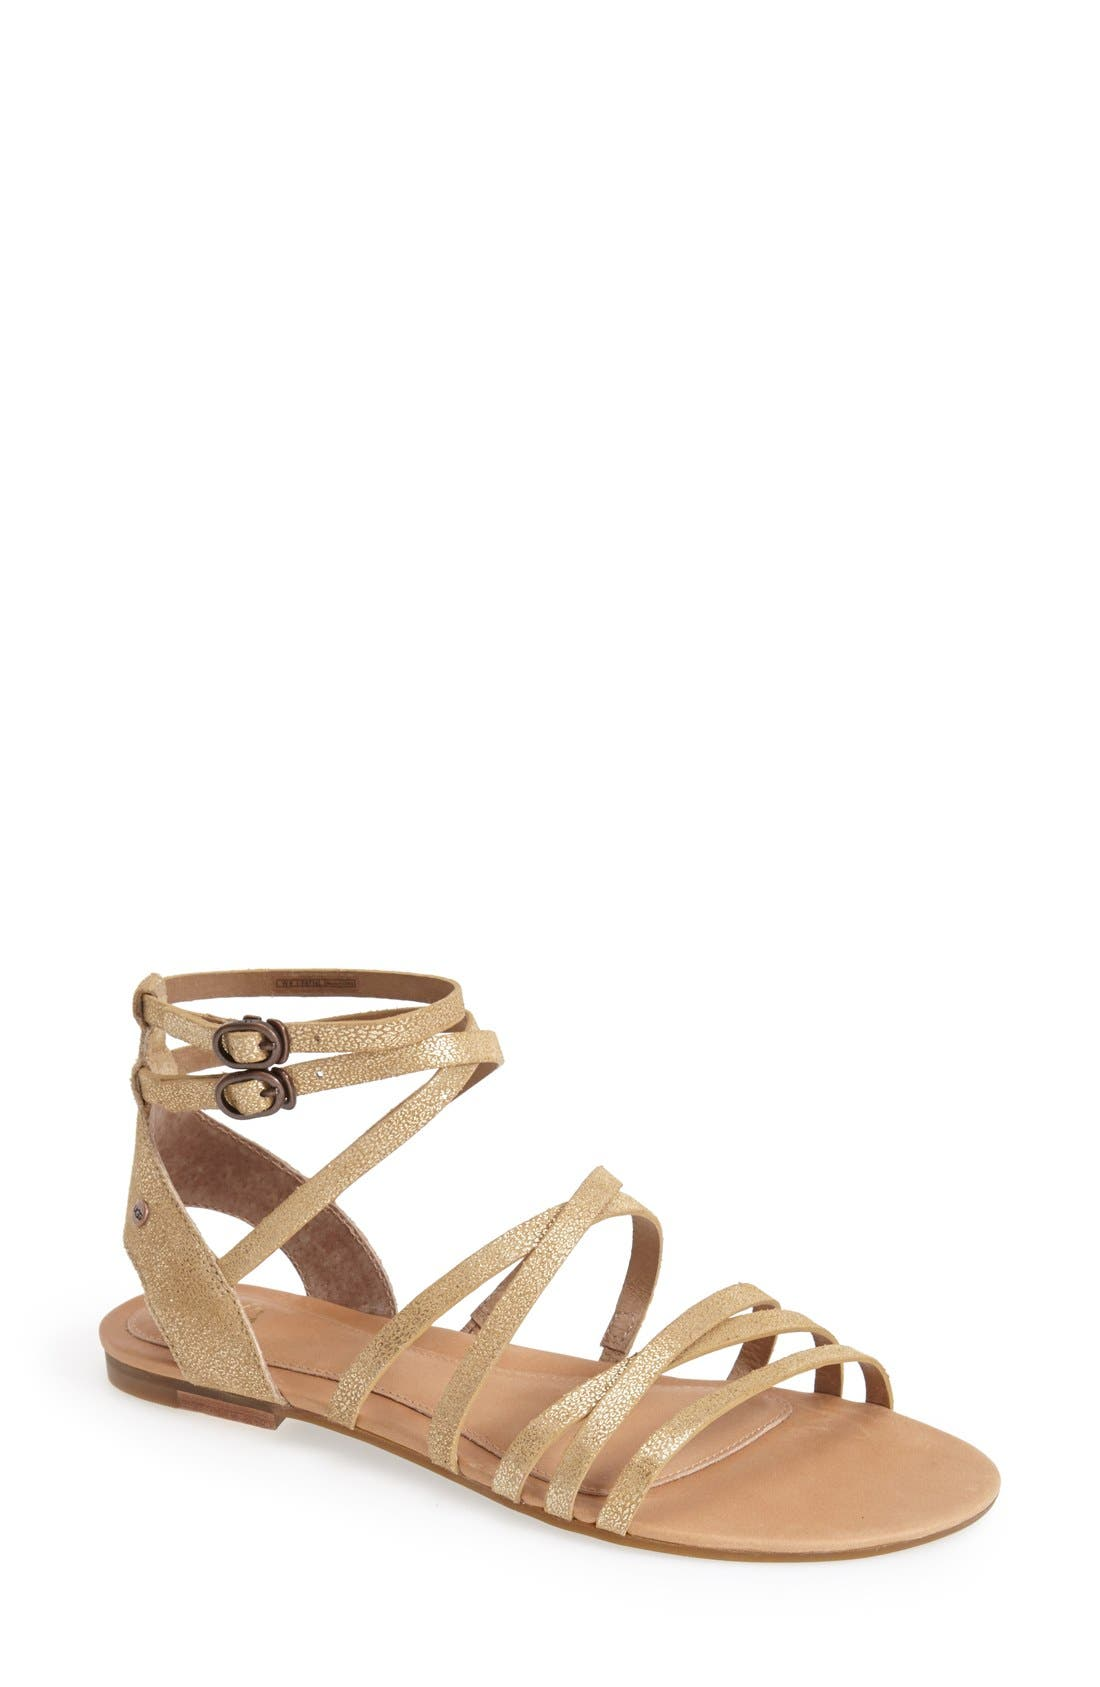 Alternate Image 1 Selected - UGG® Australia 'Devie' Metallic Leather Sandal (Women)